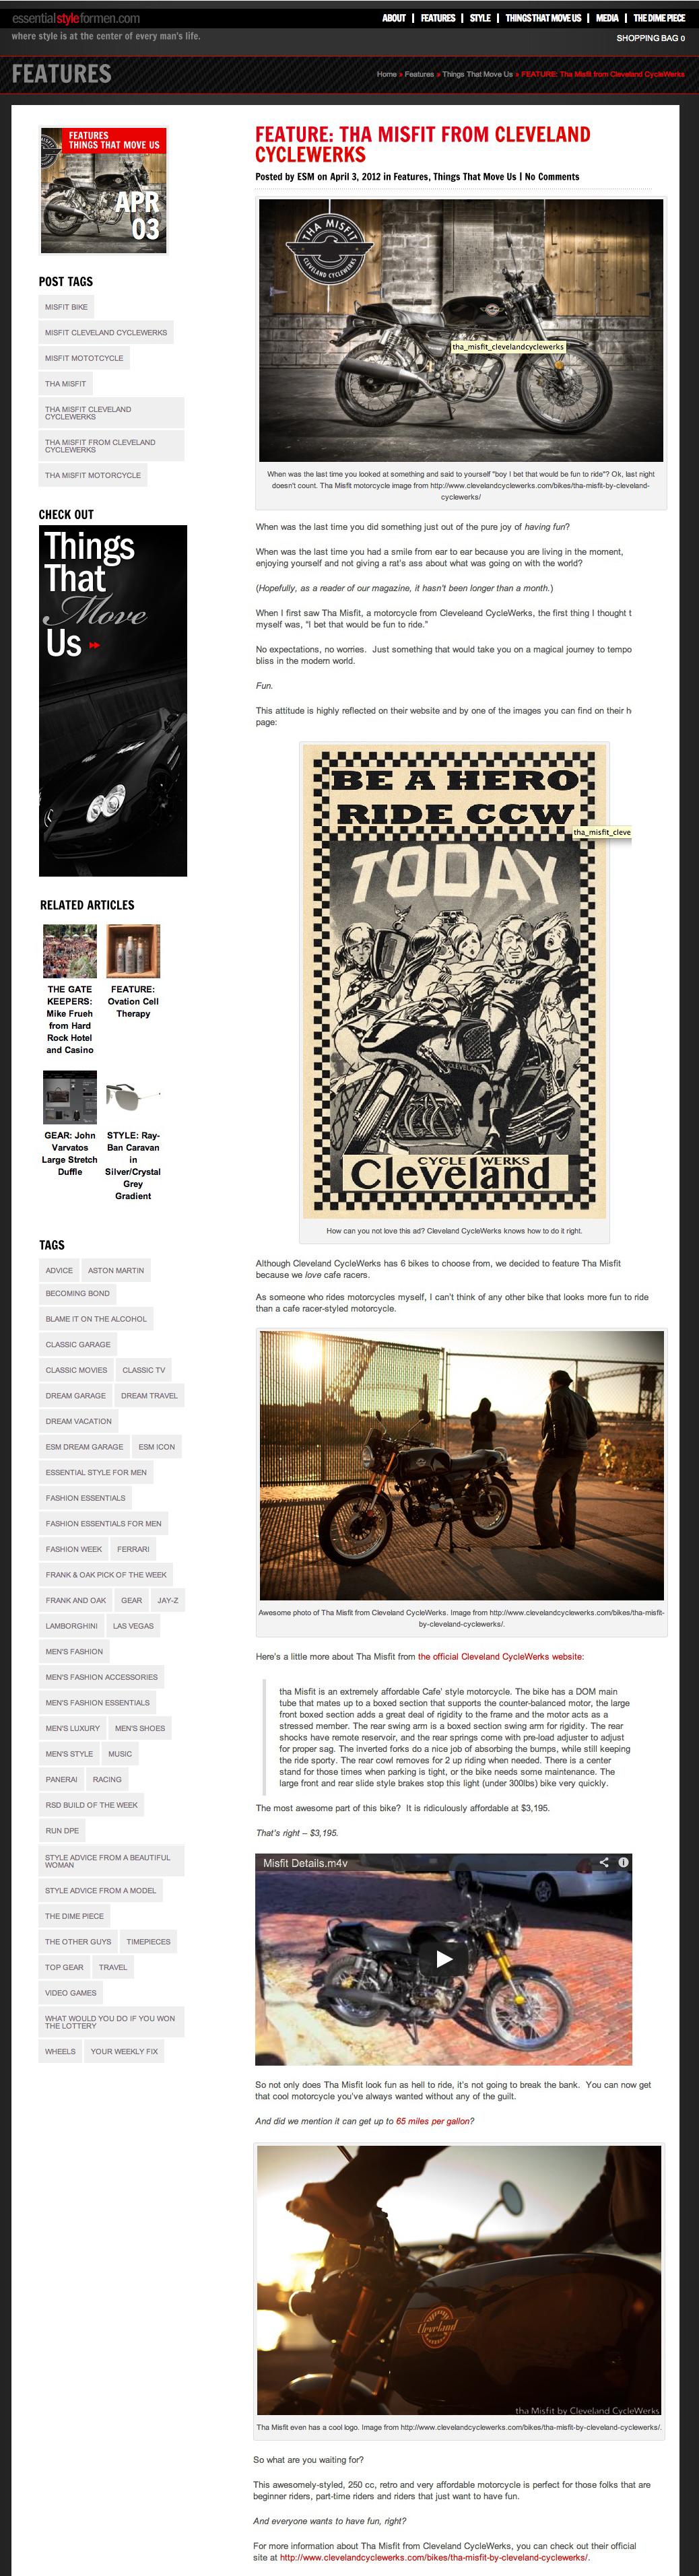 Esential-Style-For-Men-CCW-2012.jpg